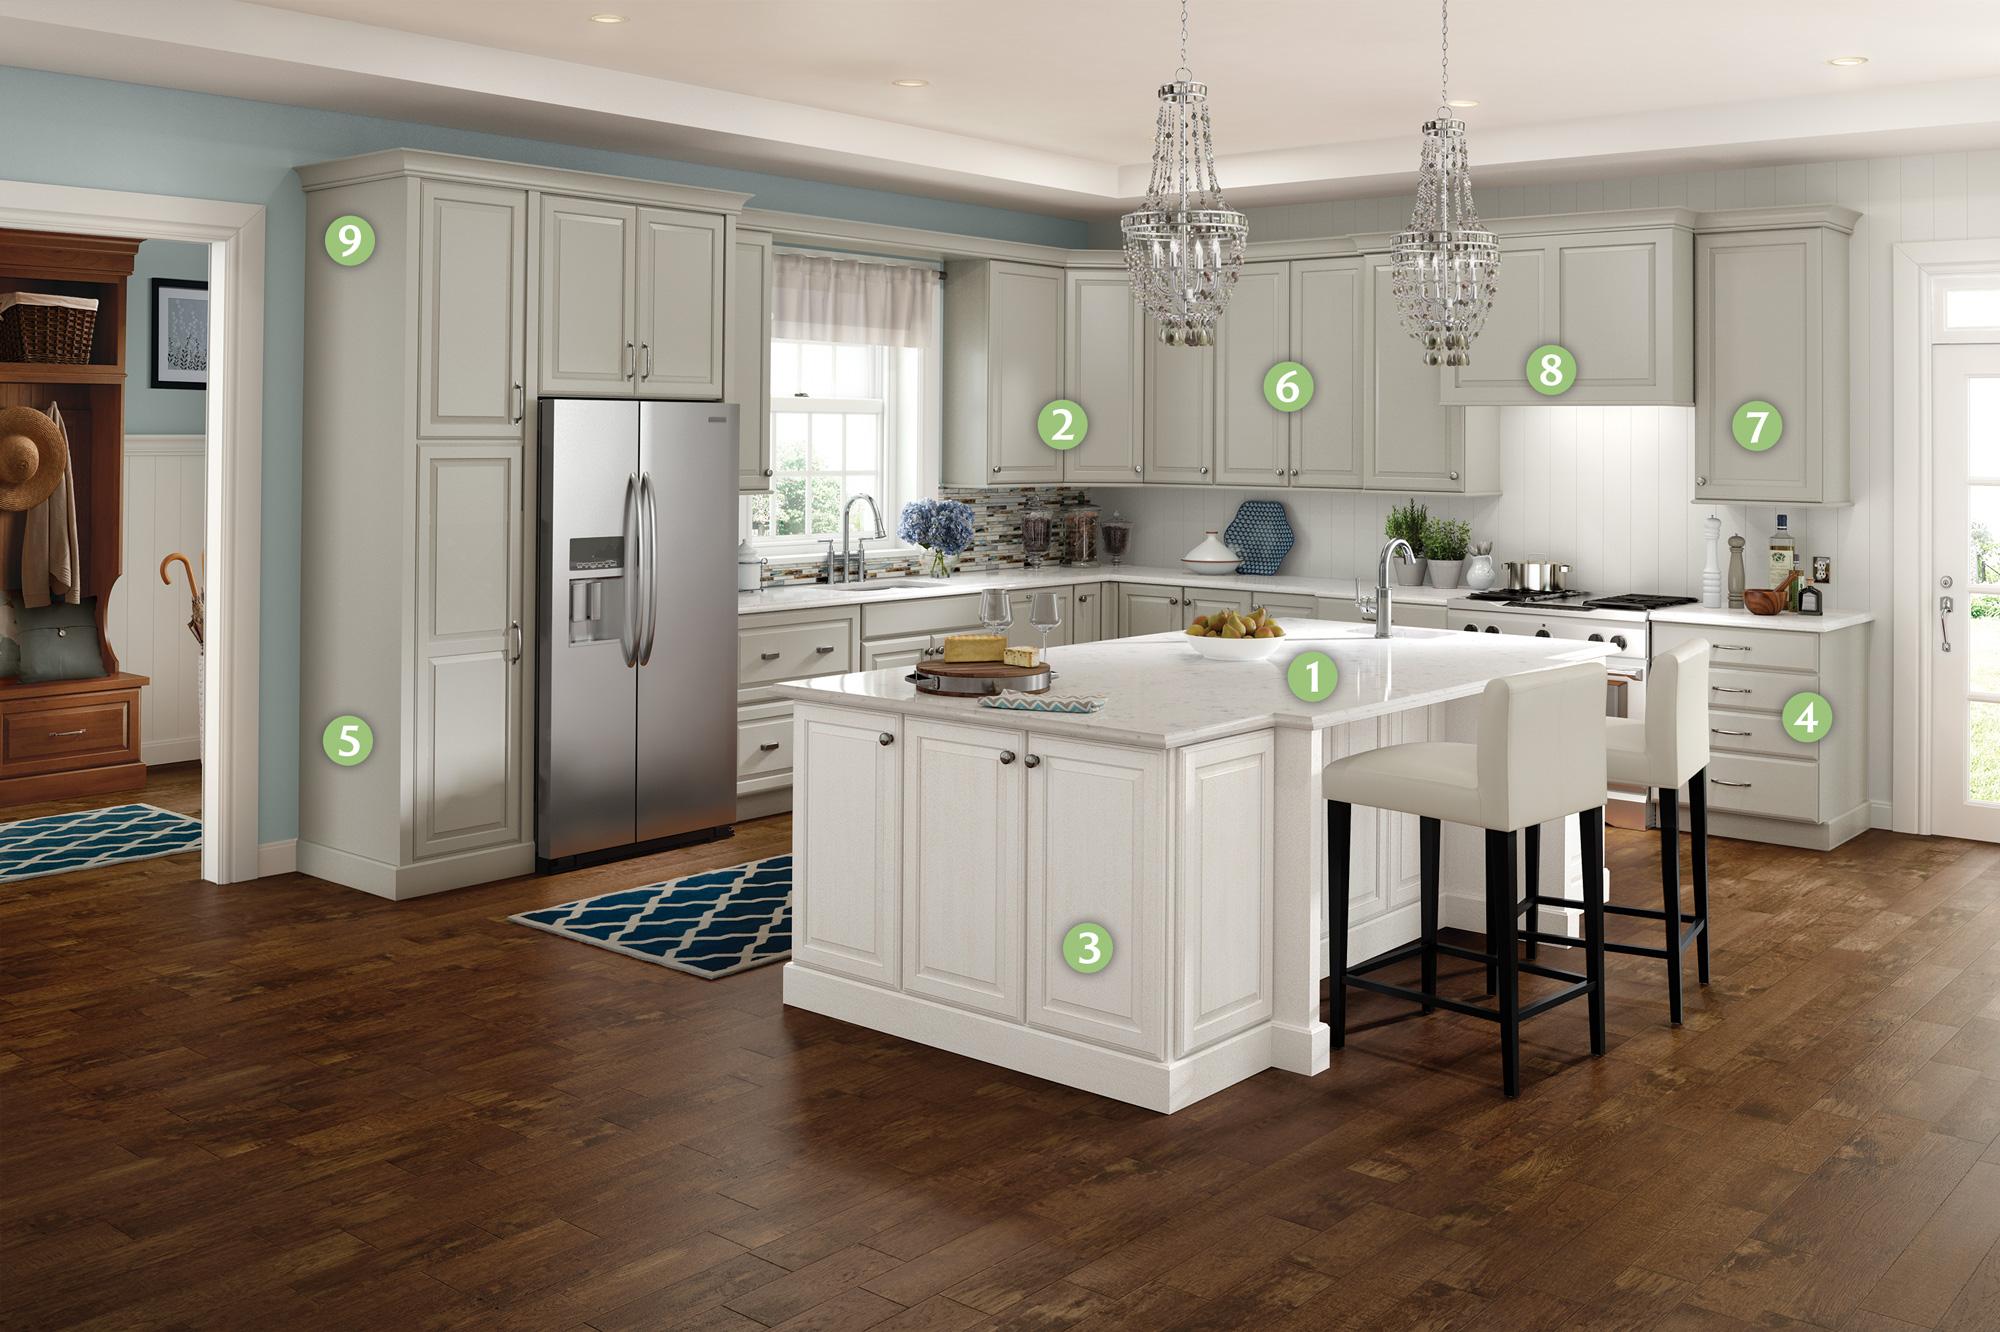 Kitchen After Personalization